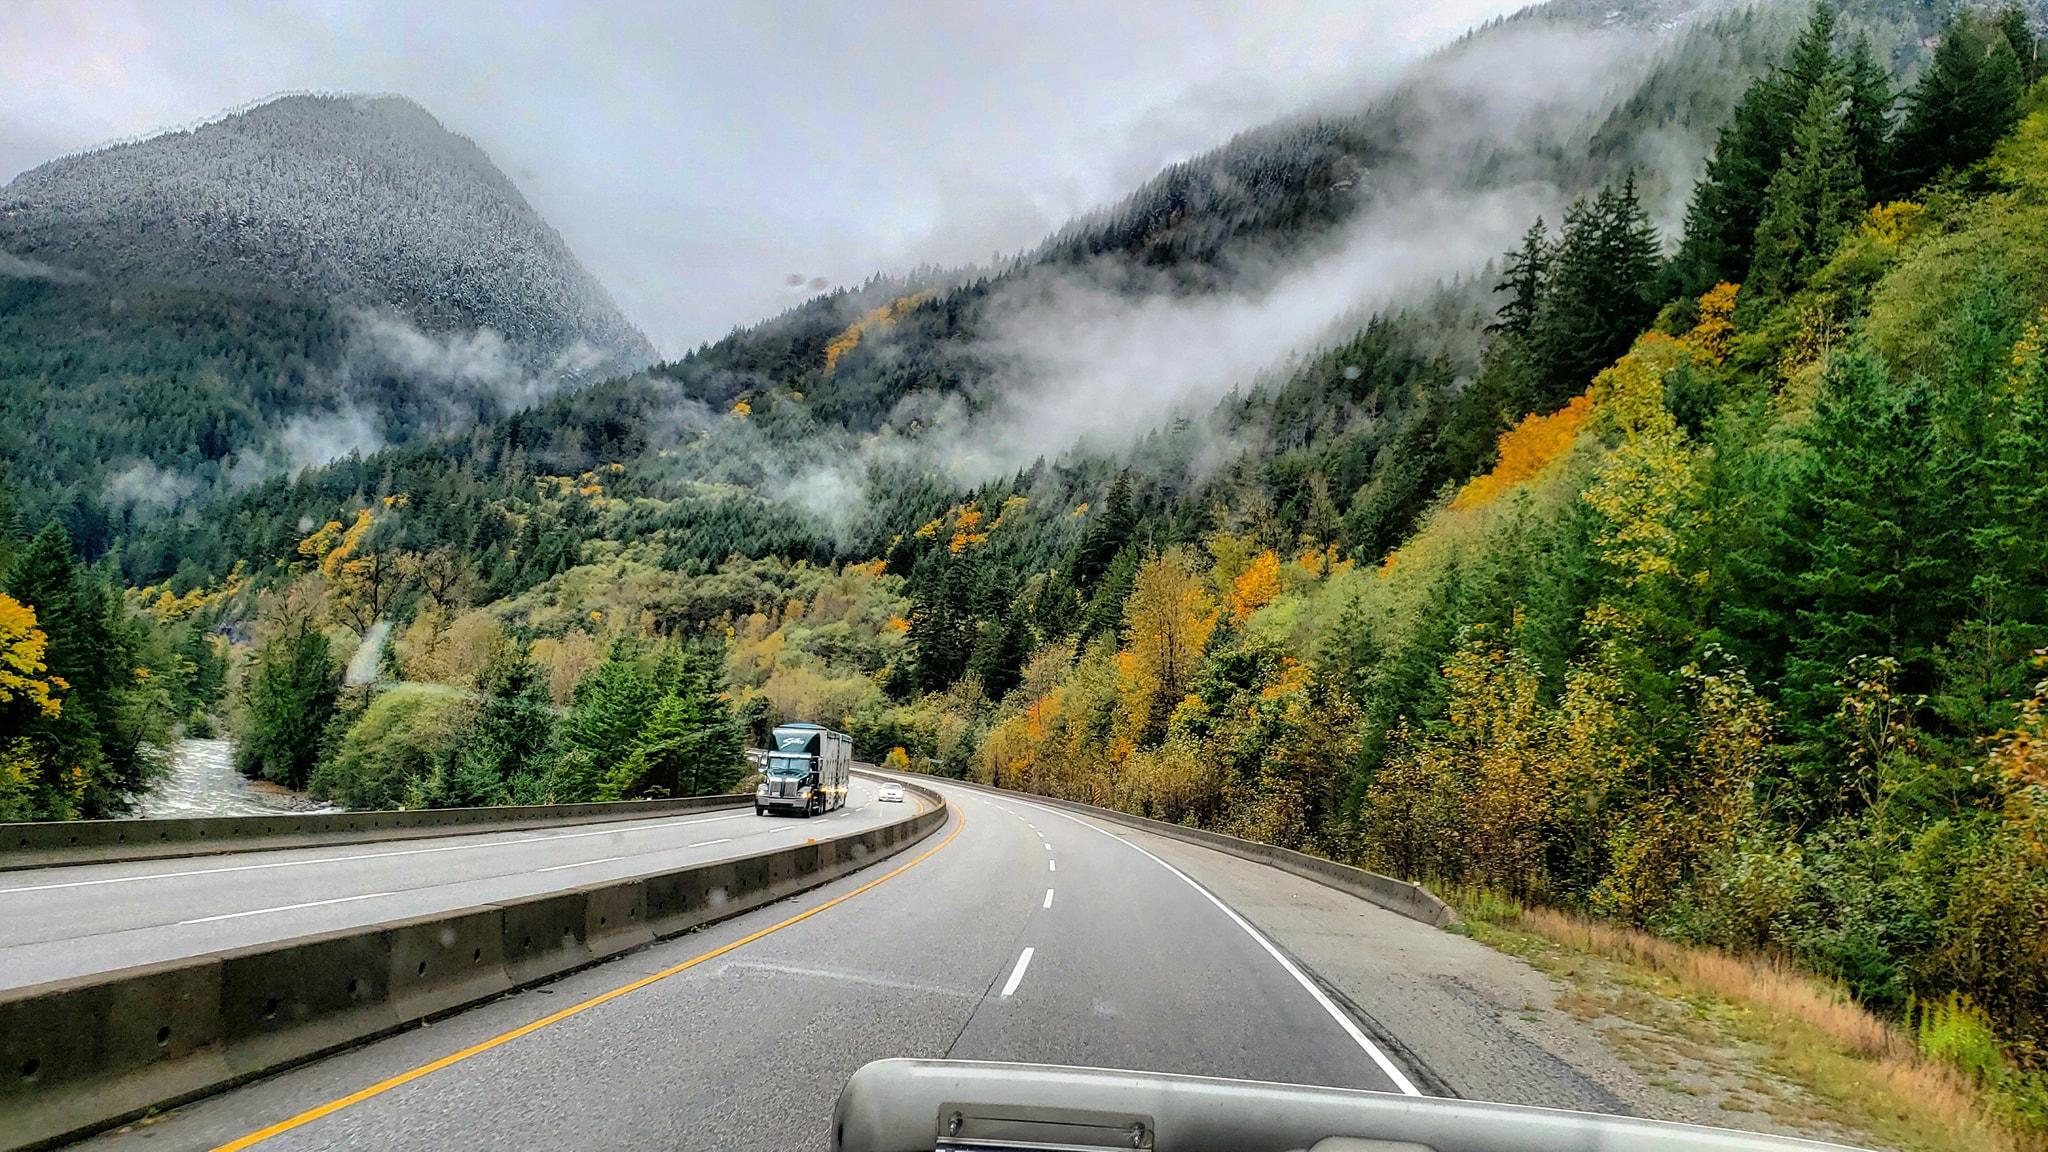 9-10-2019--Hope-Canada-opweg-naar-Vancouver-(11)